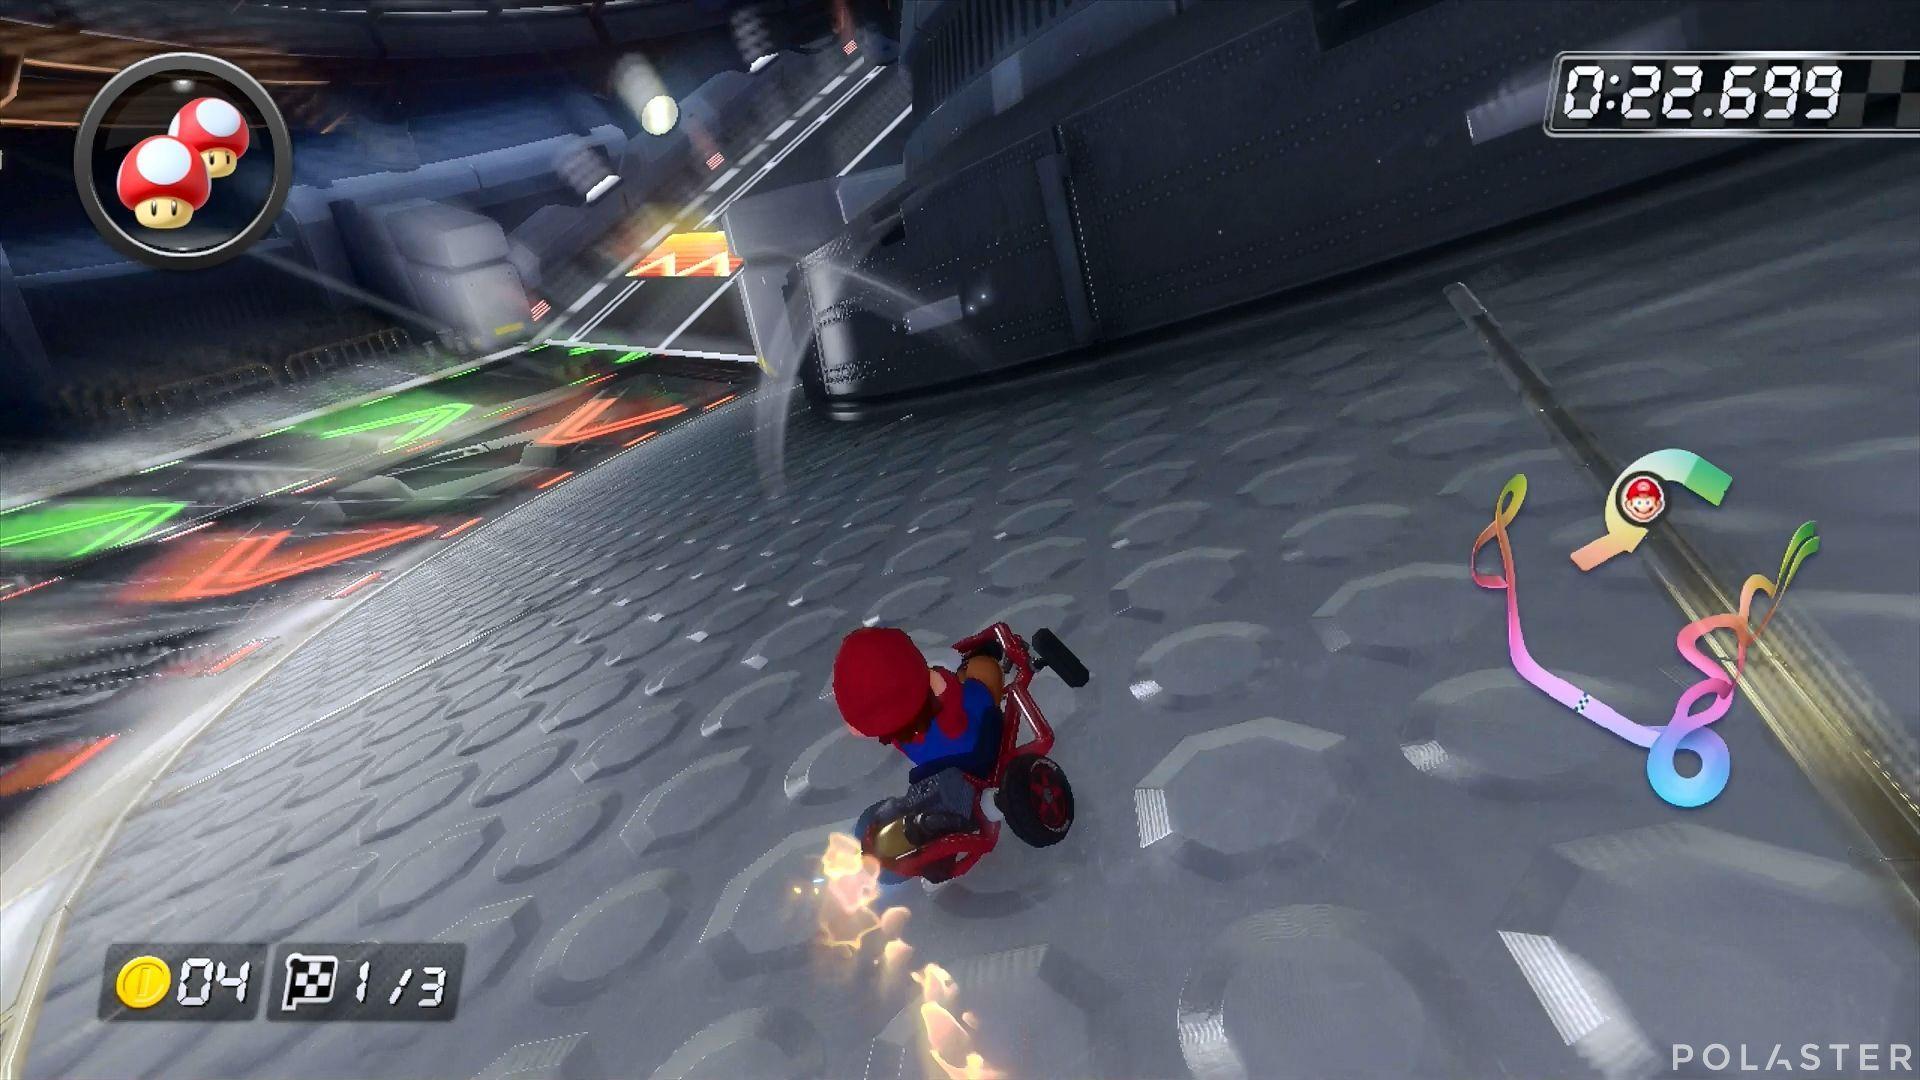 Mario Kart 8 - Senda Arco Iris